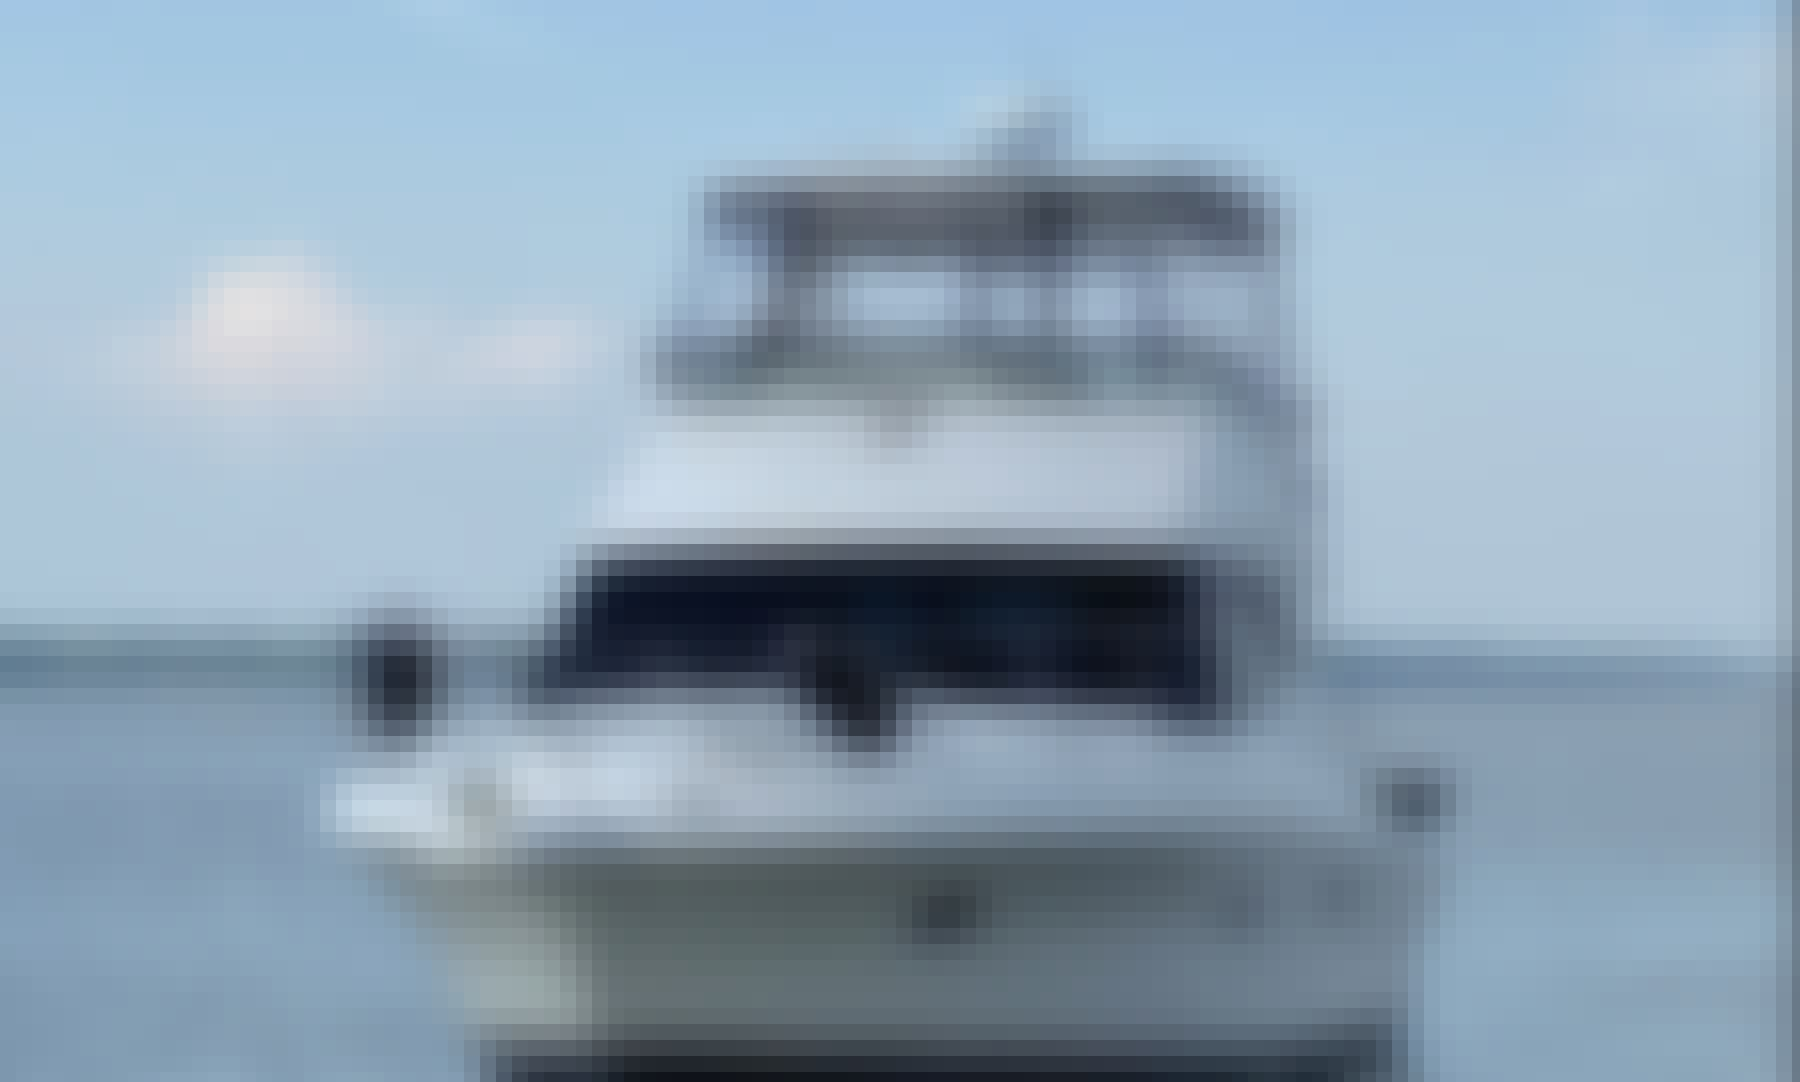 Silverton Flybridge Yacht For Charter in Colonial Beach, Virginia